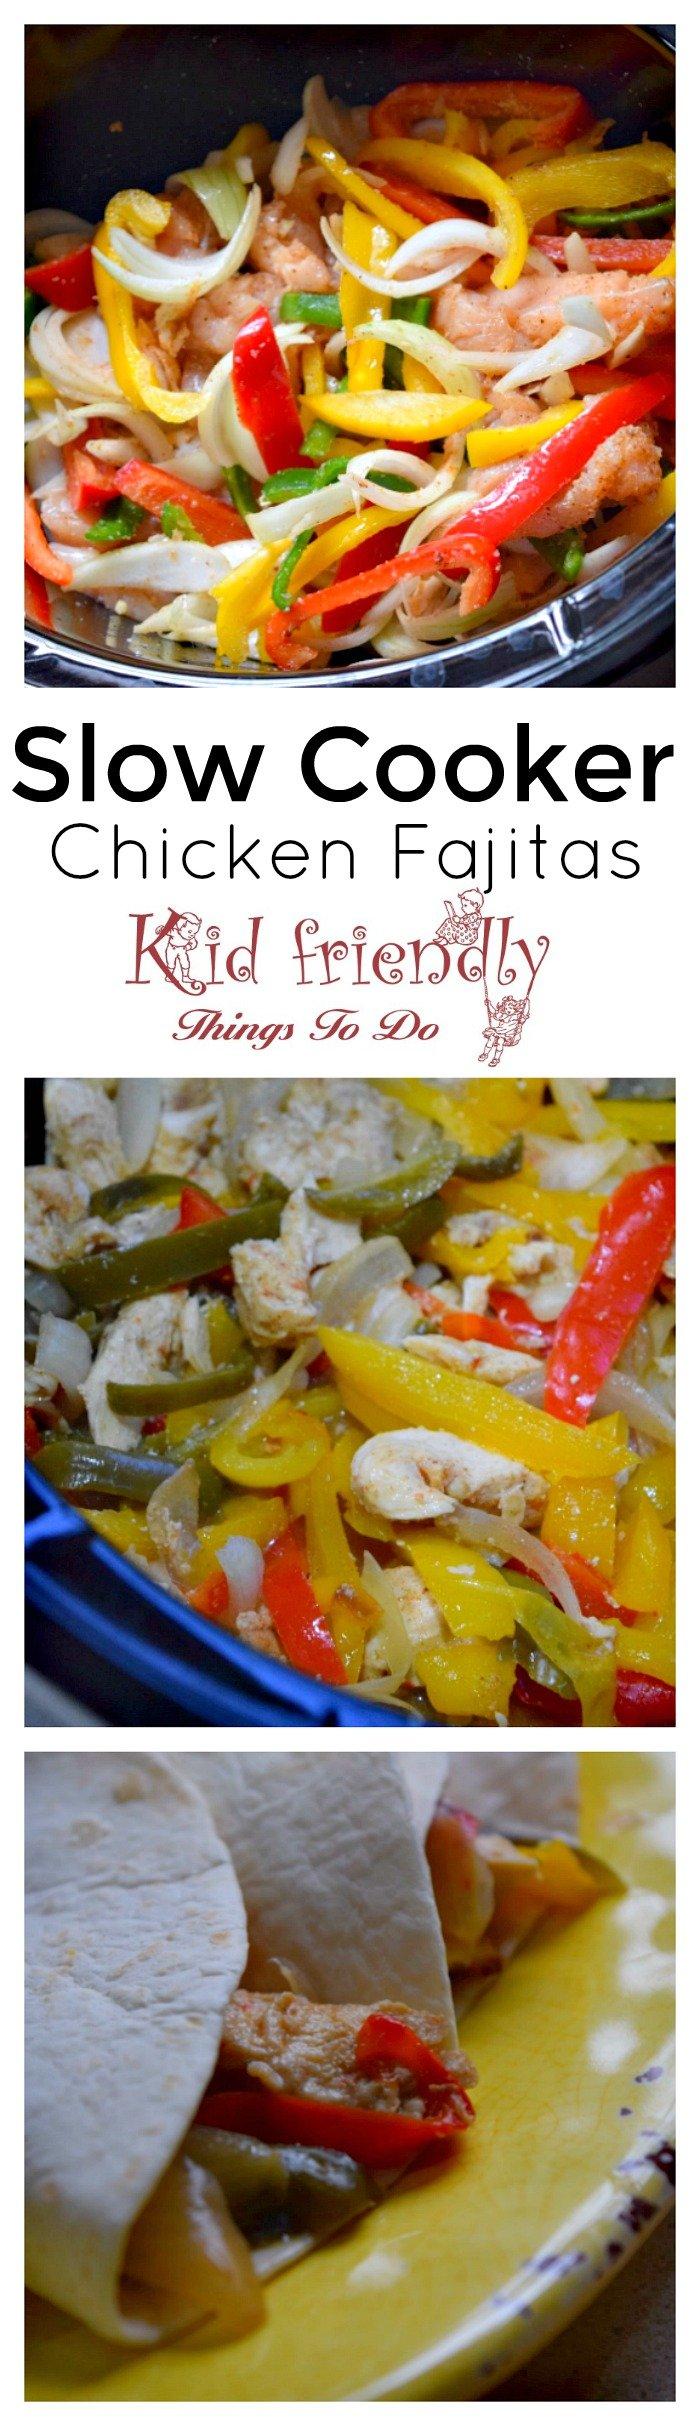 Busy night Easy and Delicious Slow Cooker Chicken Fajitas Recipe - www.kidfriendlythingstodo.com